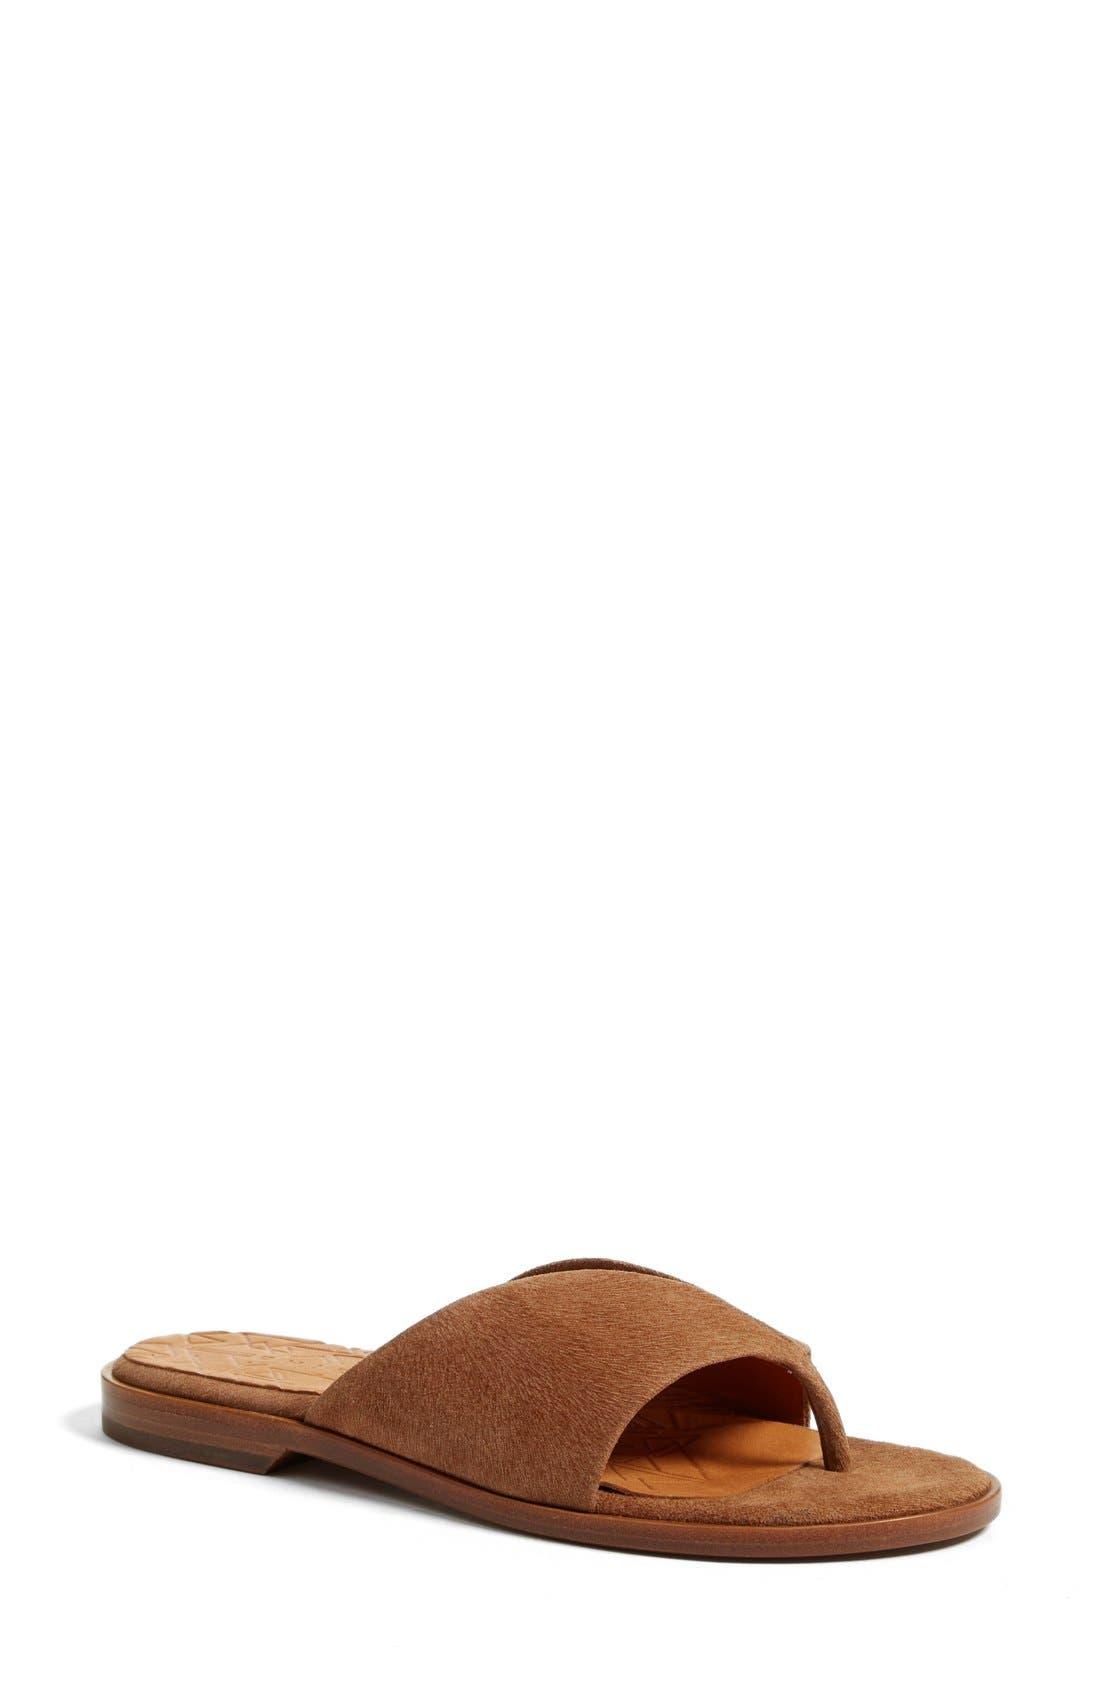 Quepa Flip Flop,                         Main,                         color, 200